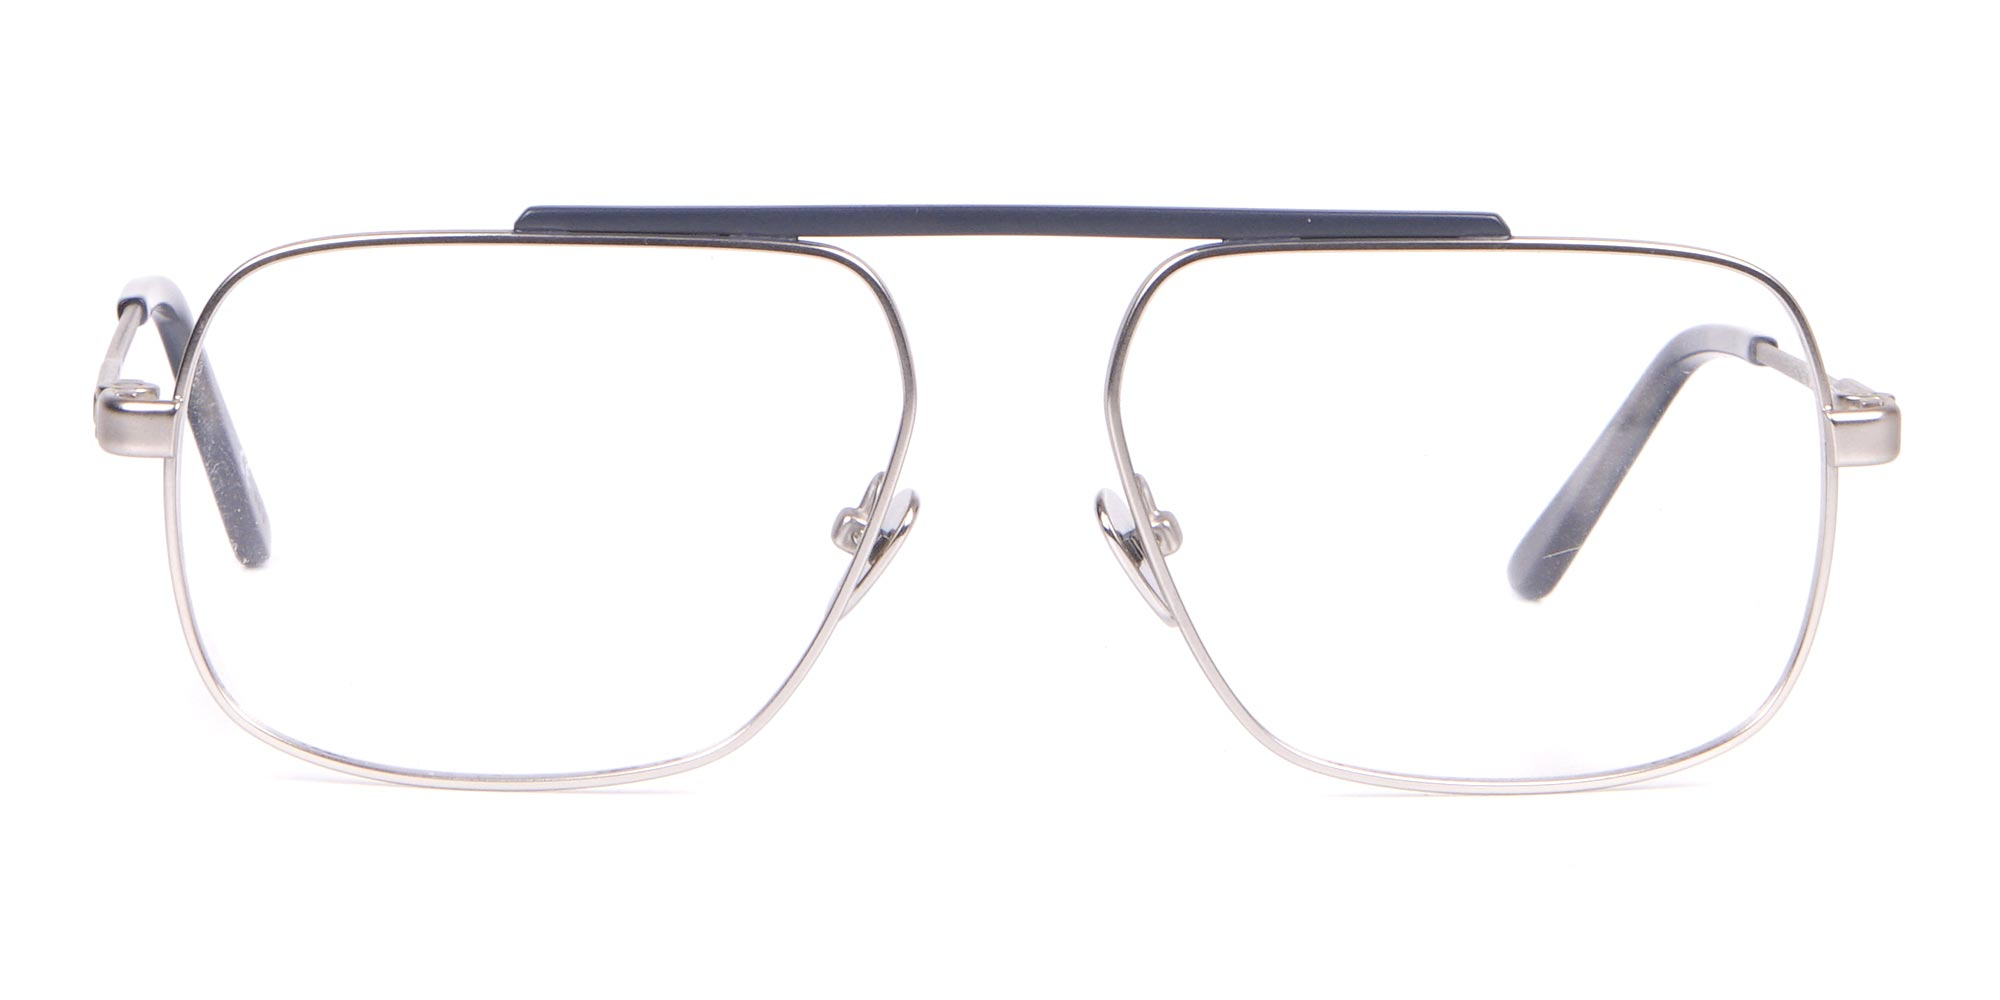 Calvin Klein Bridgeless Silver Glasses in Rectangular